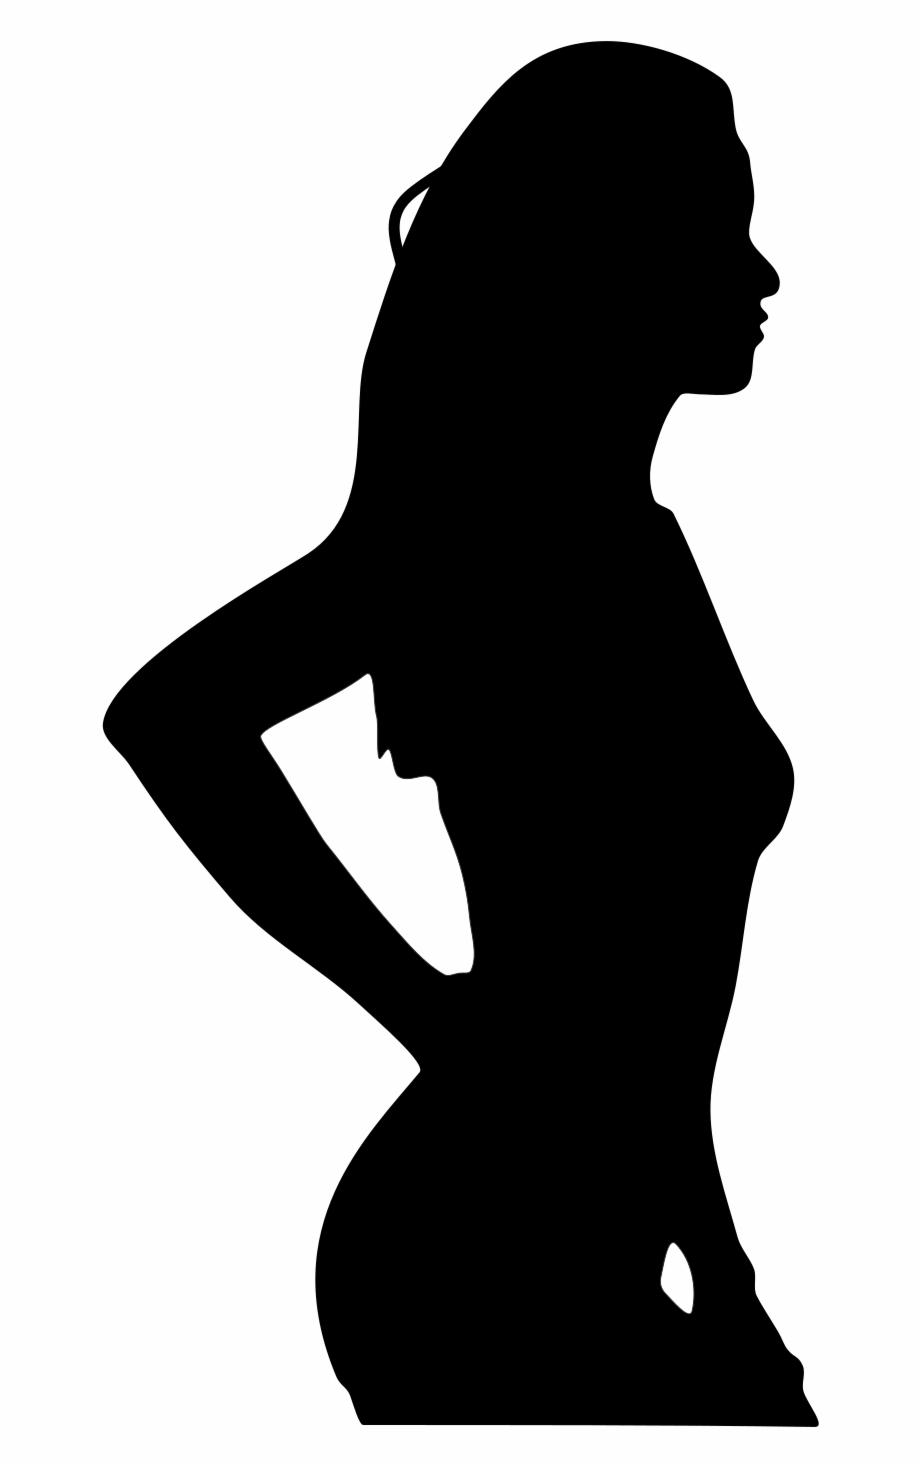 Women s ministry clipart silhouette jpg royalty free stock Woman Silhouette, Women\'s Ministry, Wedding Groom ... jpg royalty free stock